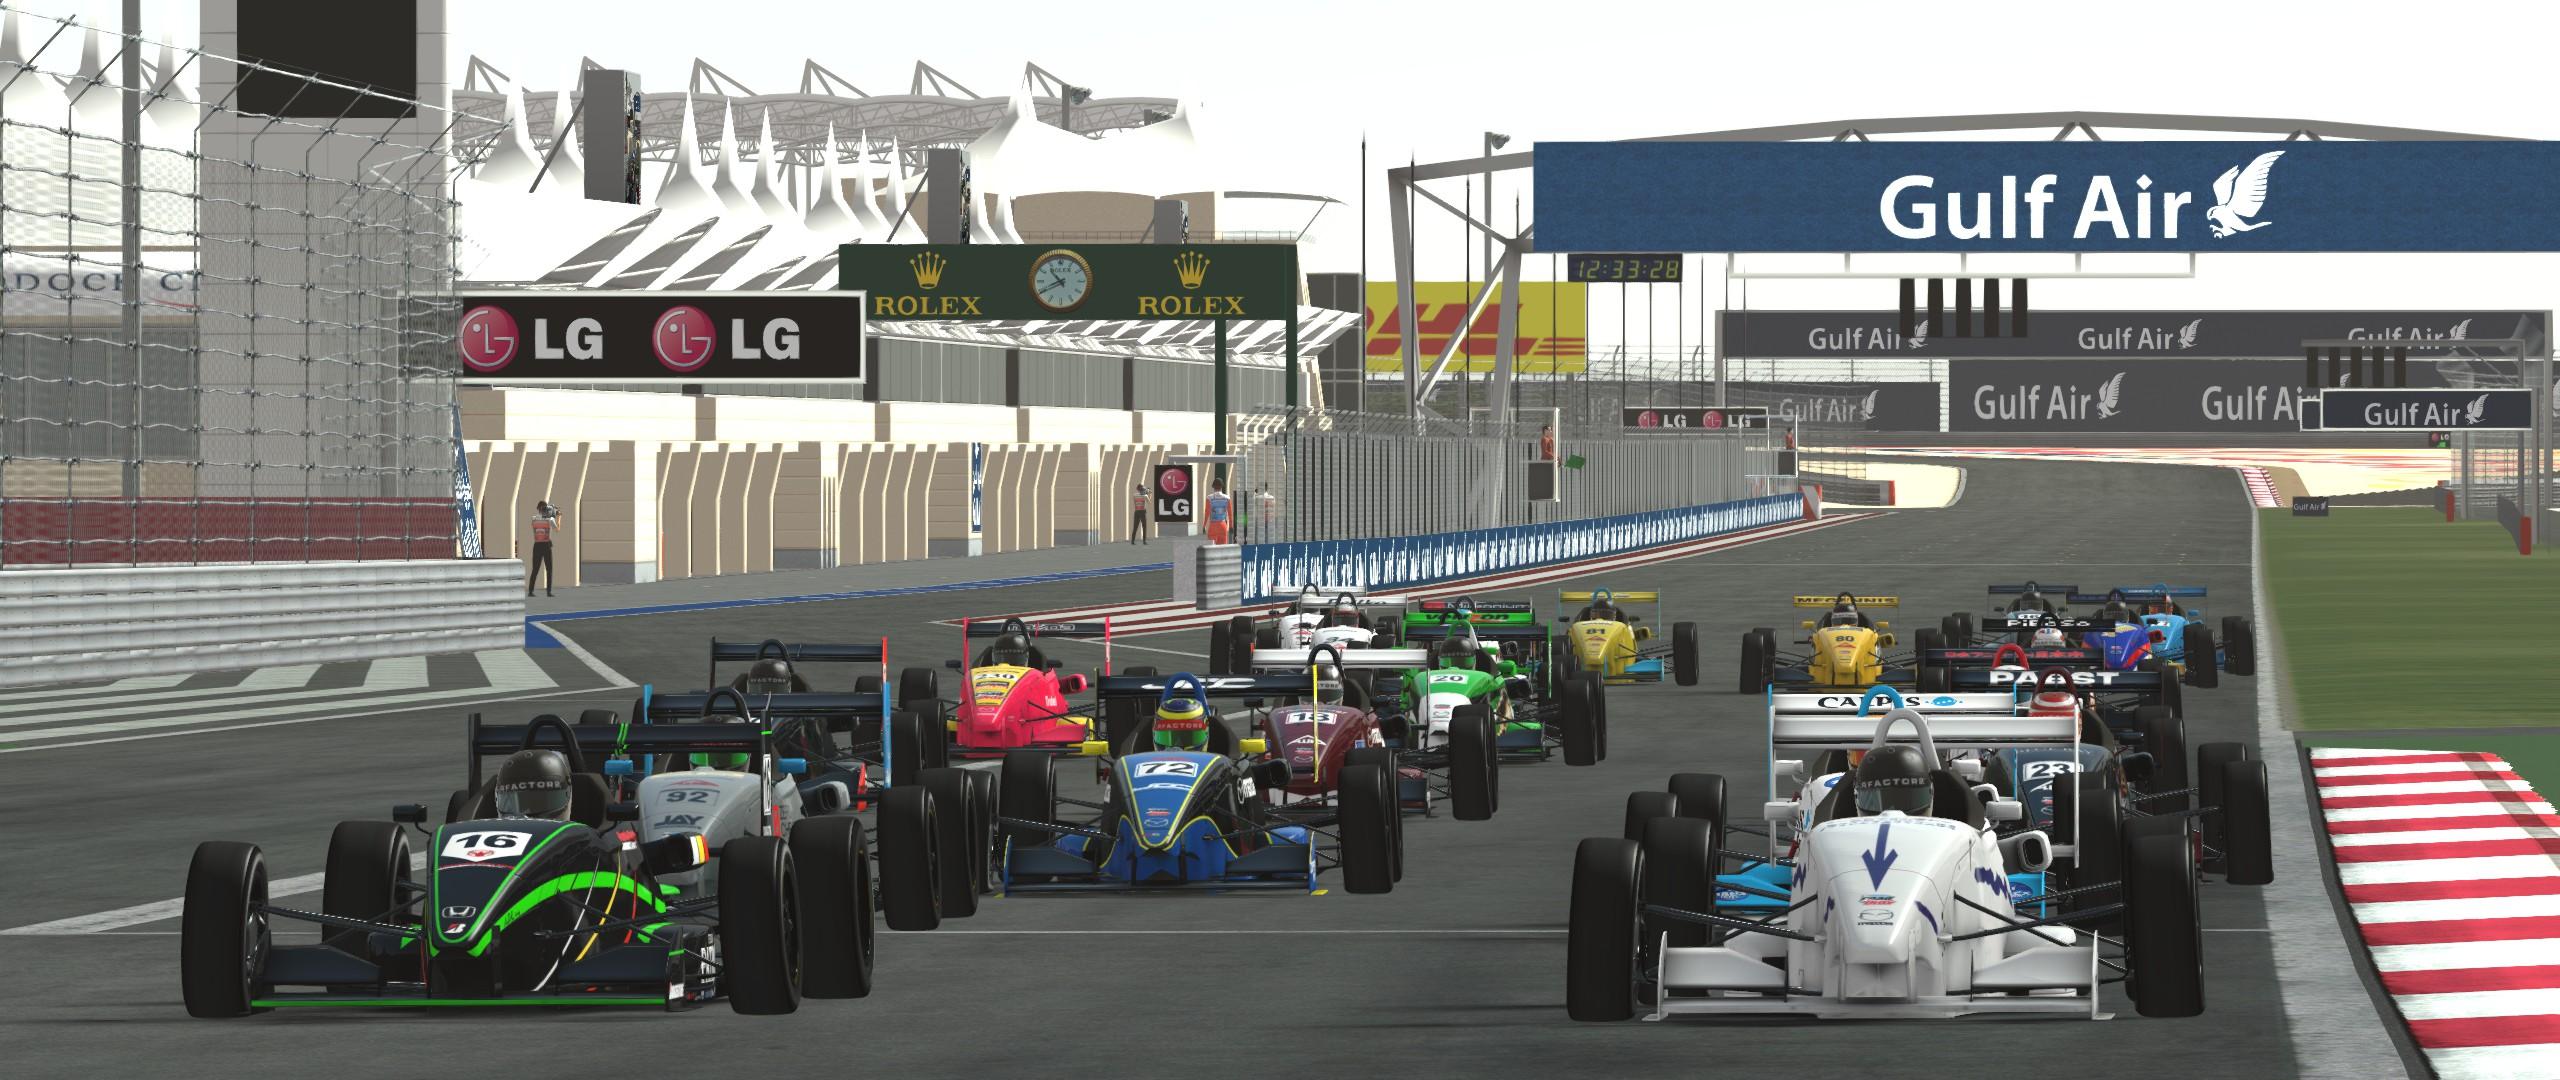 usf2000 bahrain01